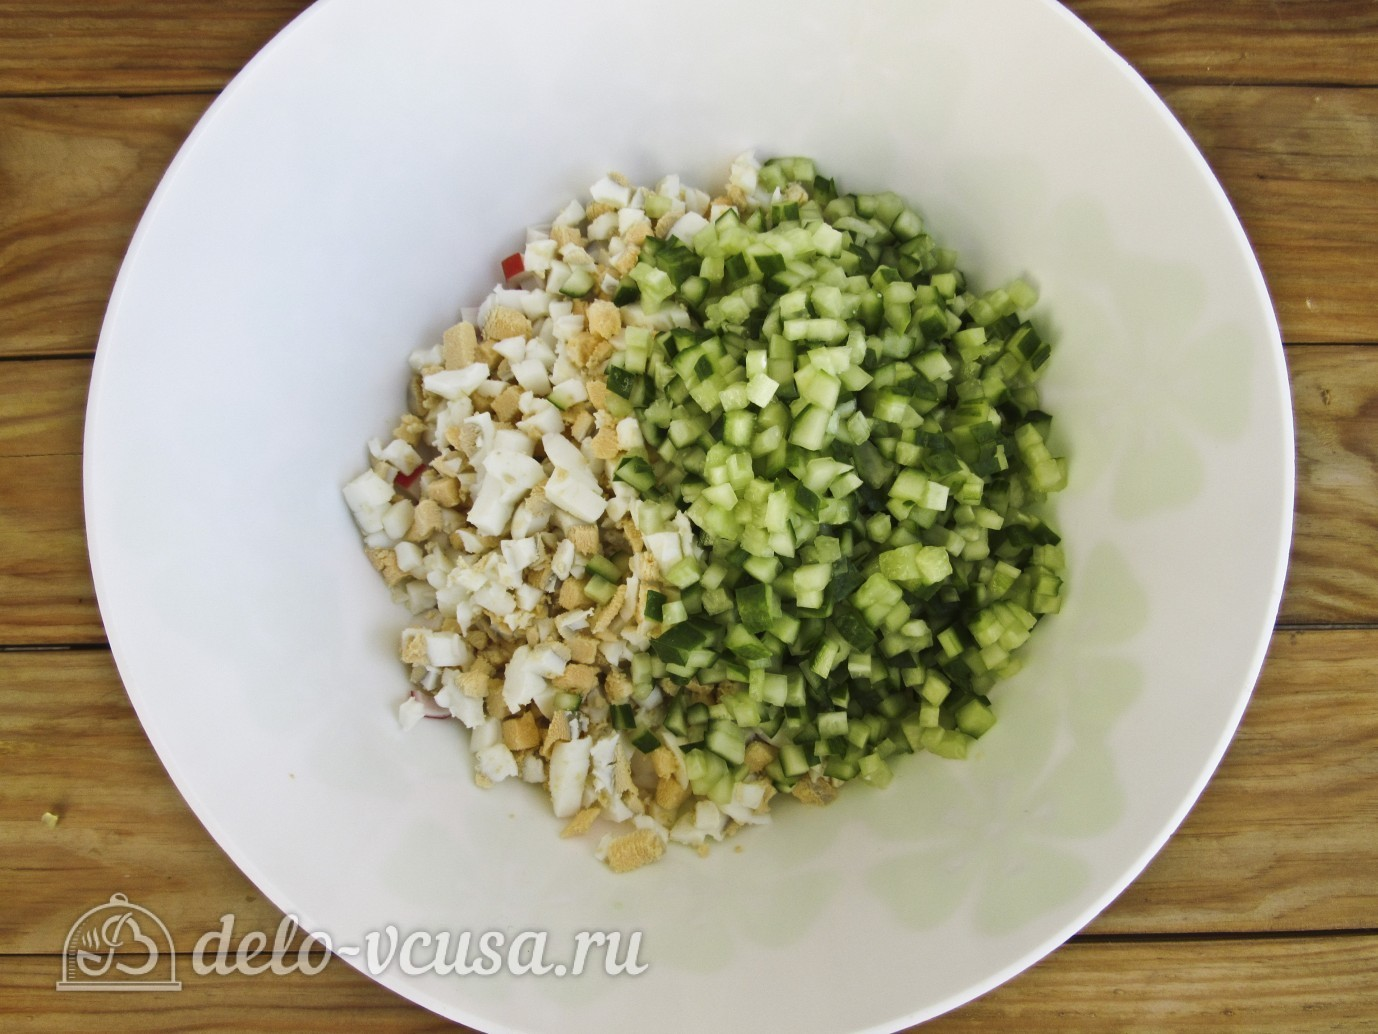 Крабовый салат с огурцом: Нарезаем огурцы